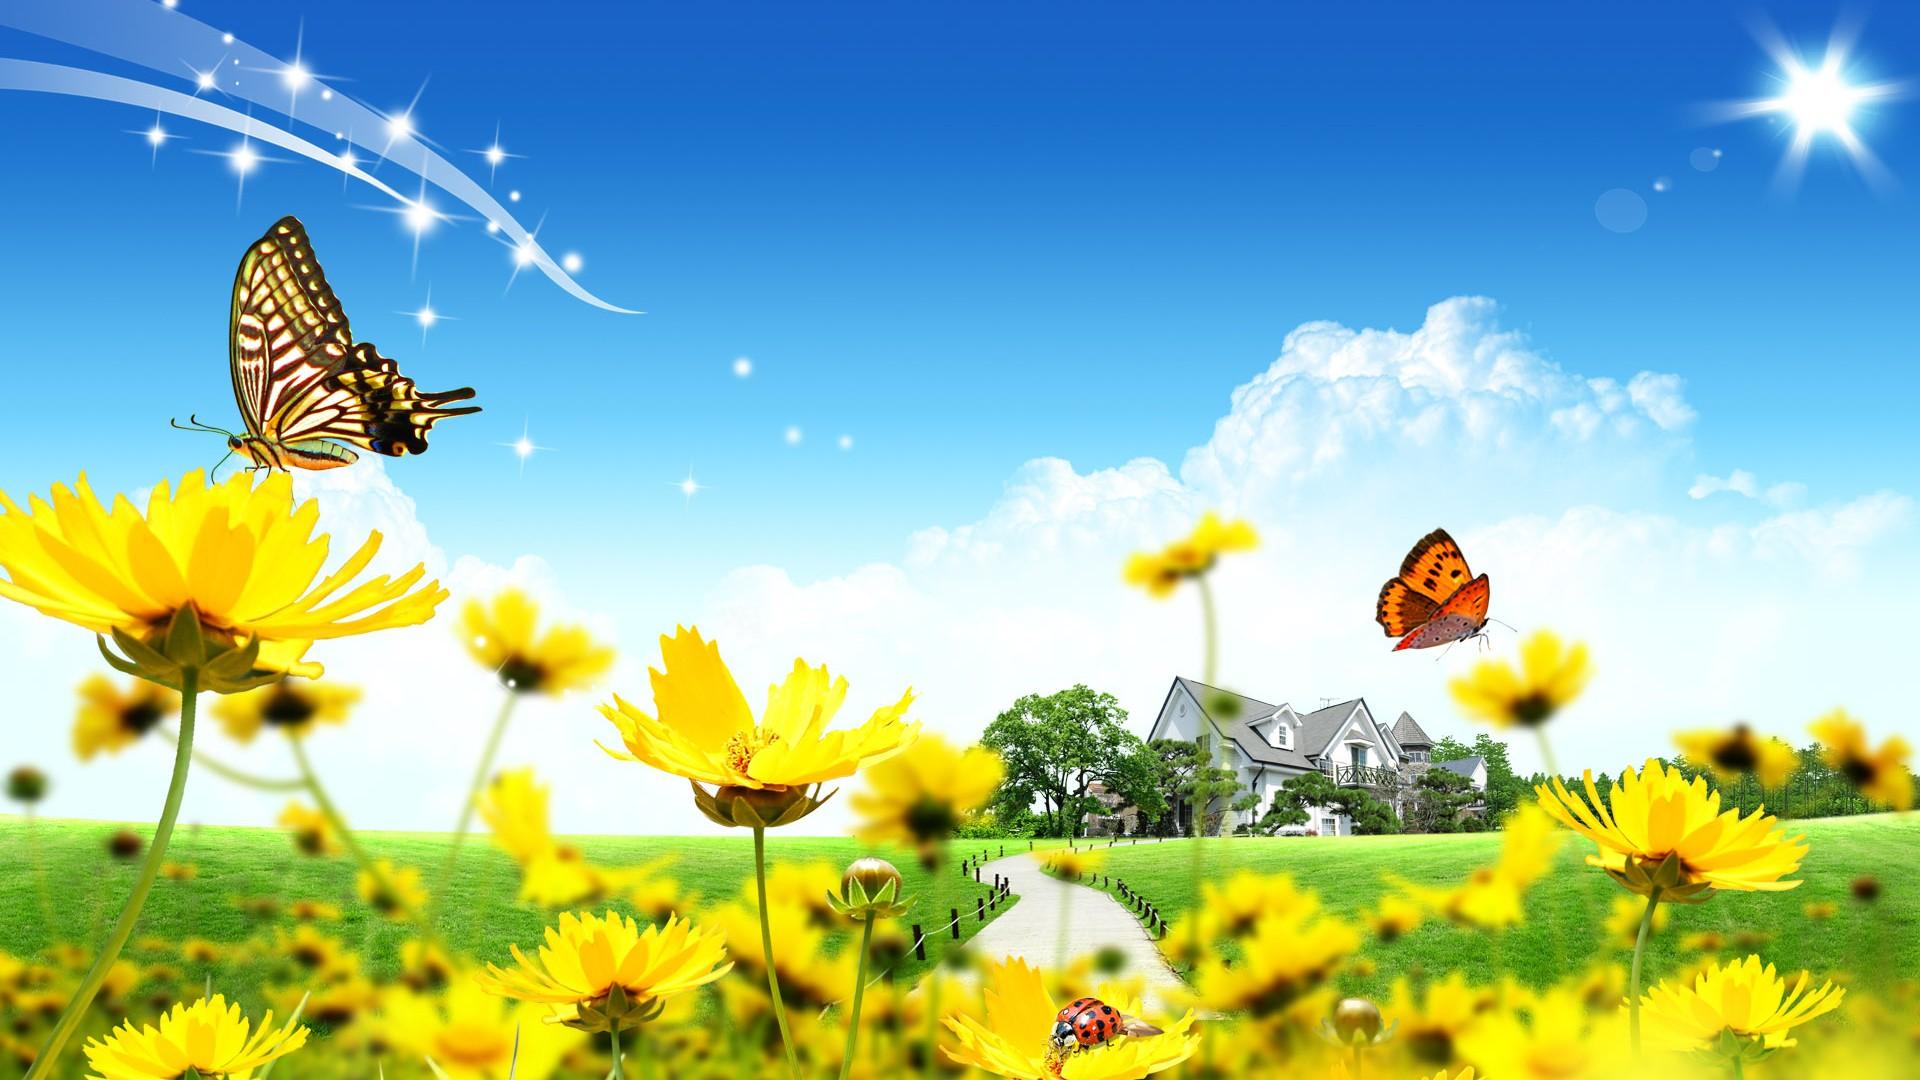 The-sunny-spring-Windows-Theme-1920×1080-wallpaper-wpc5809478